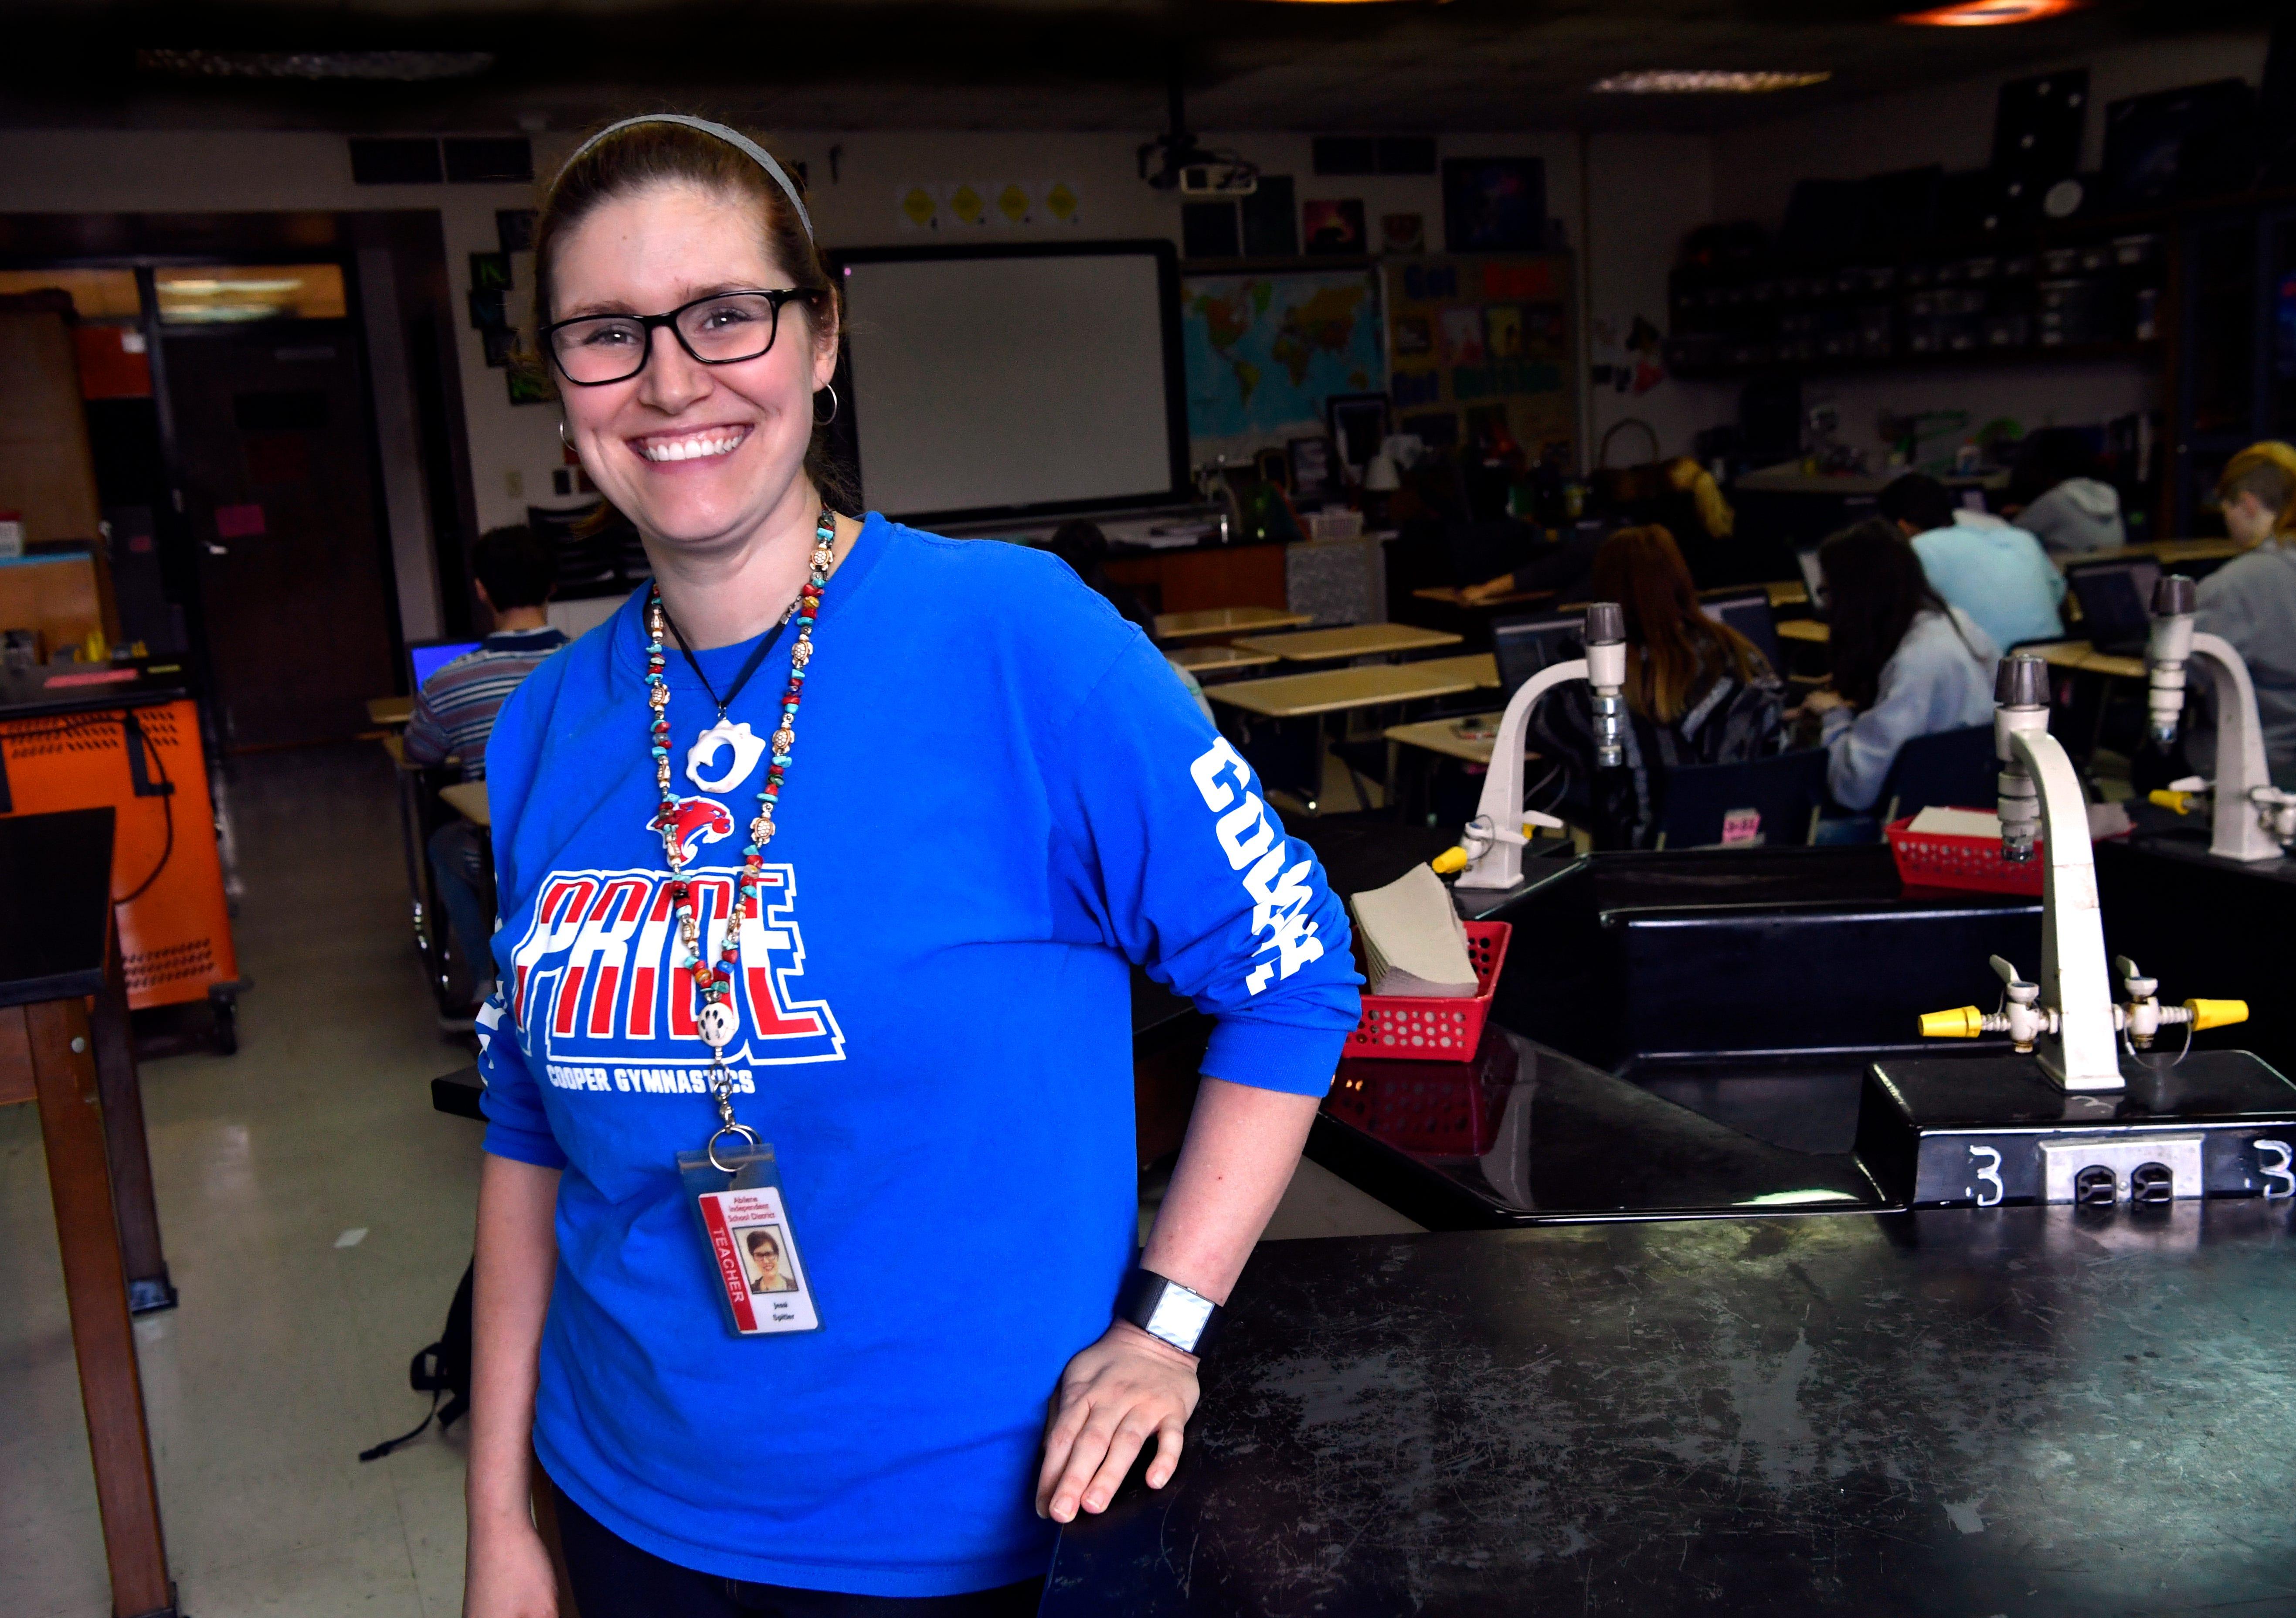 Cooper High School science teacher Jessi Spitler.